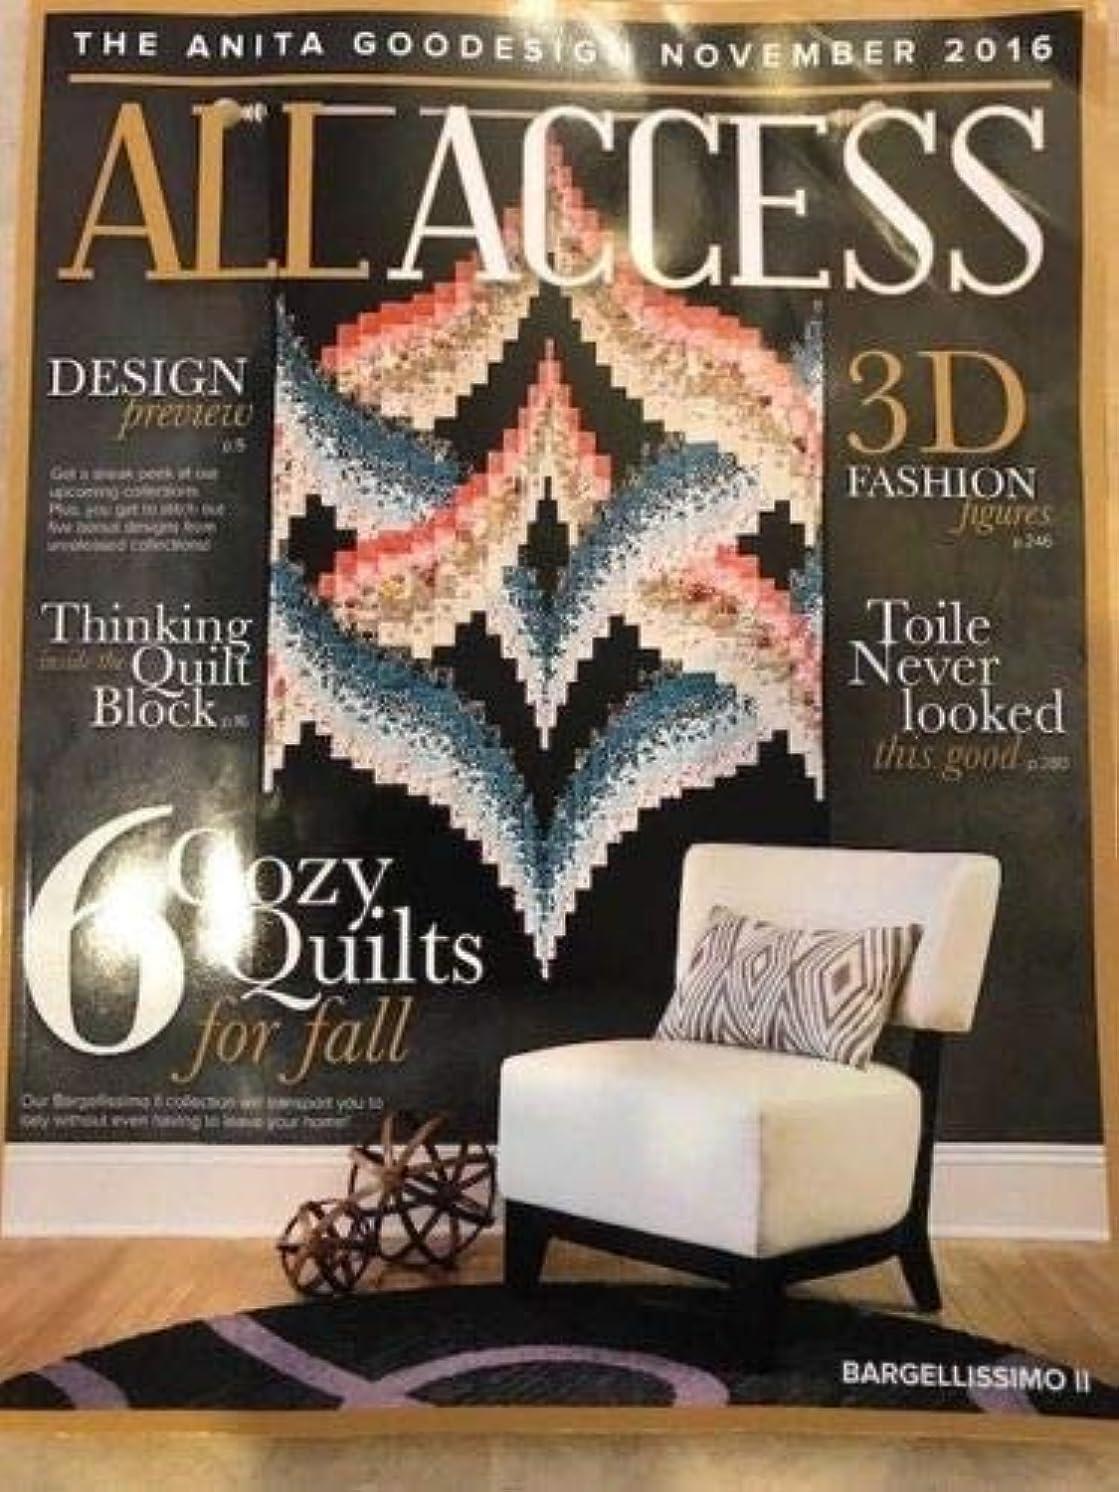 Anita Goodesign Embroidery Designs CD & Book All Access VIP Club November 2016